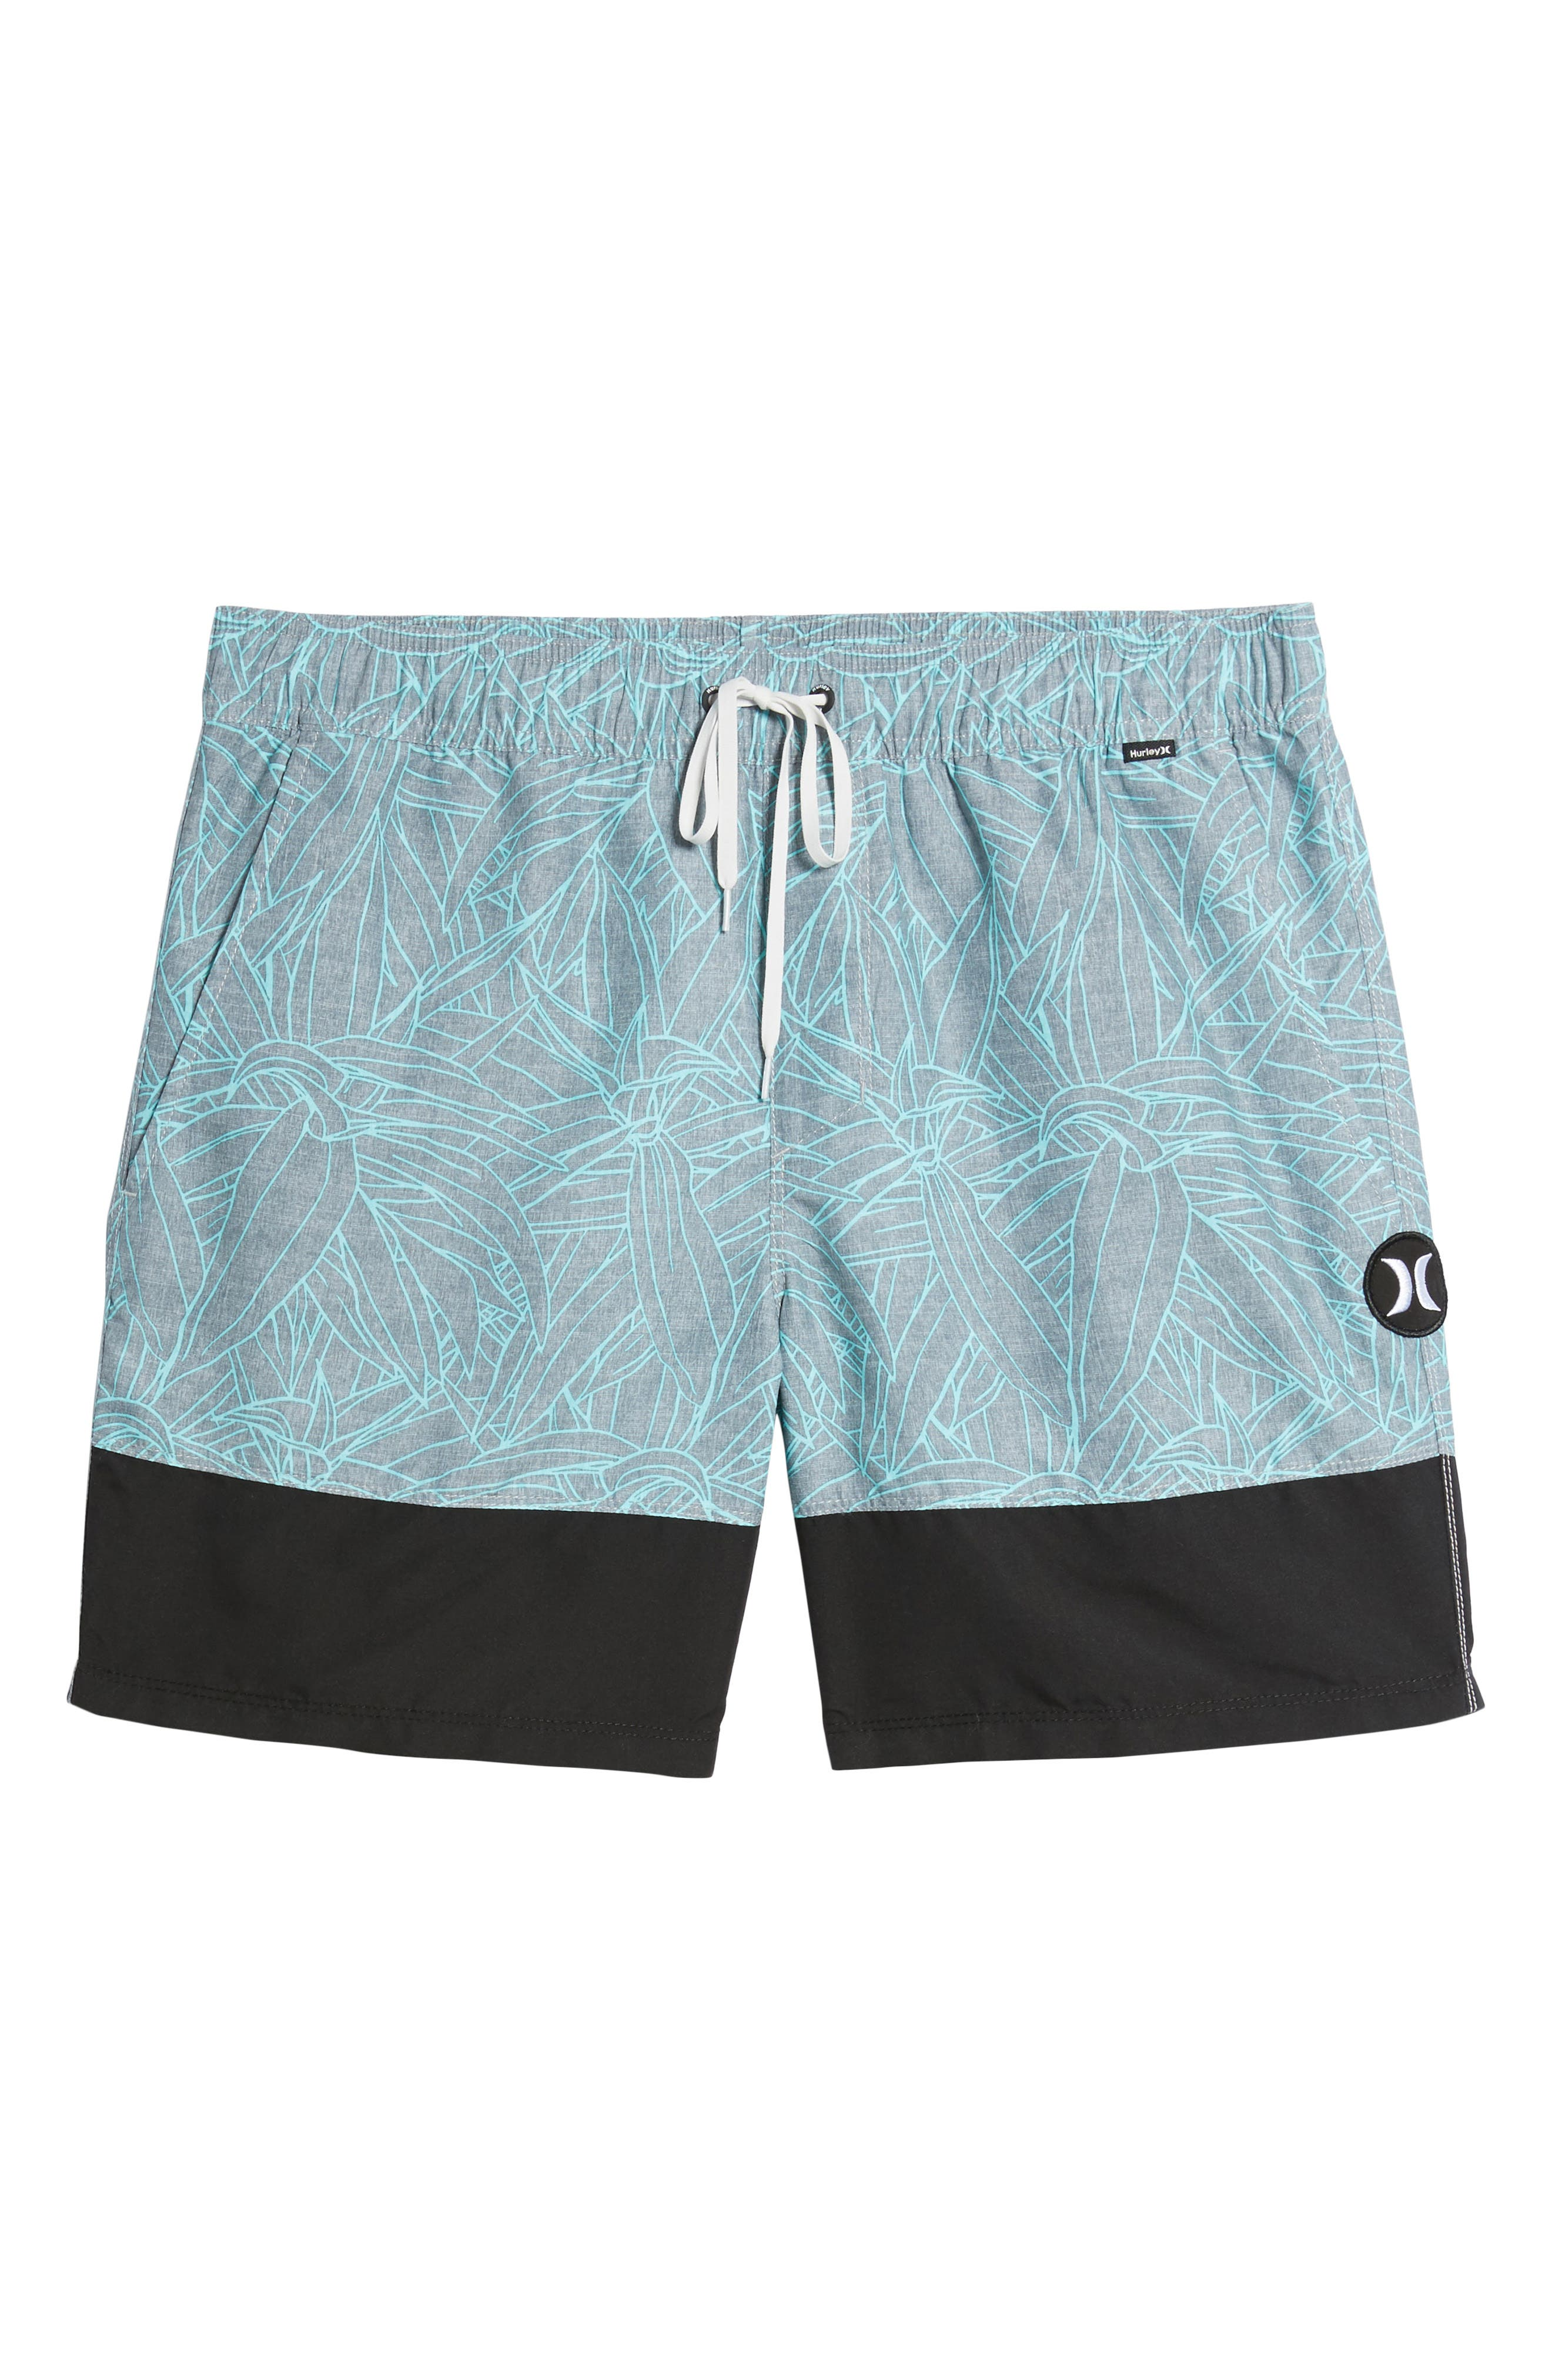 Pupkea Volley Board Shorts,                             Alternate thumbnail 6, color,                             065